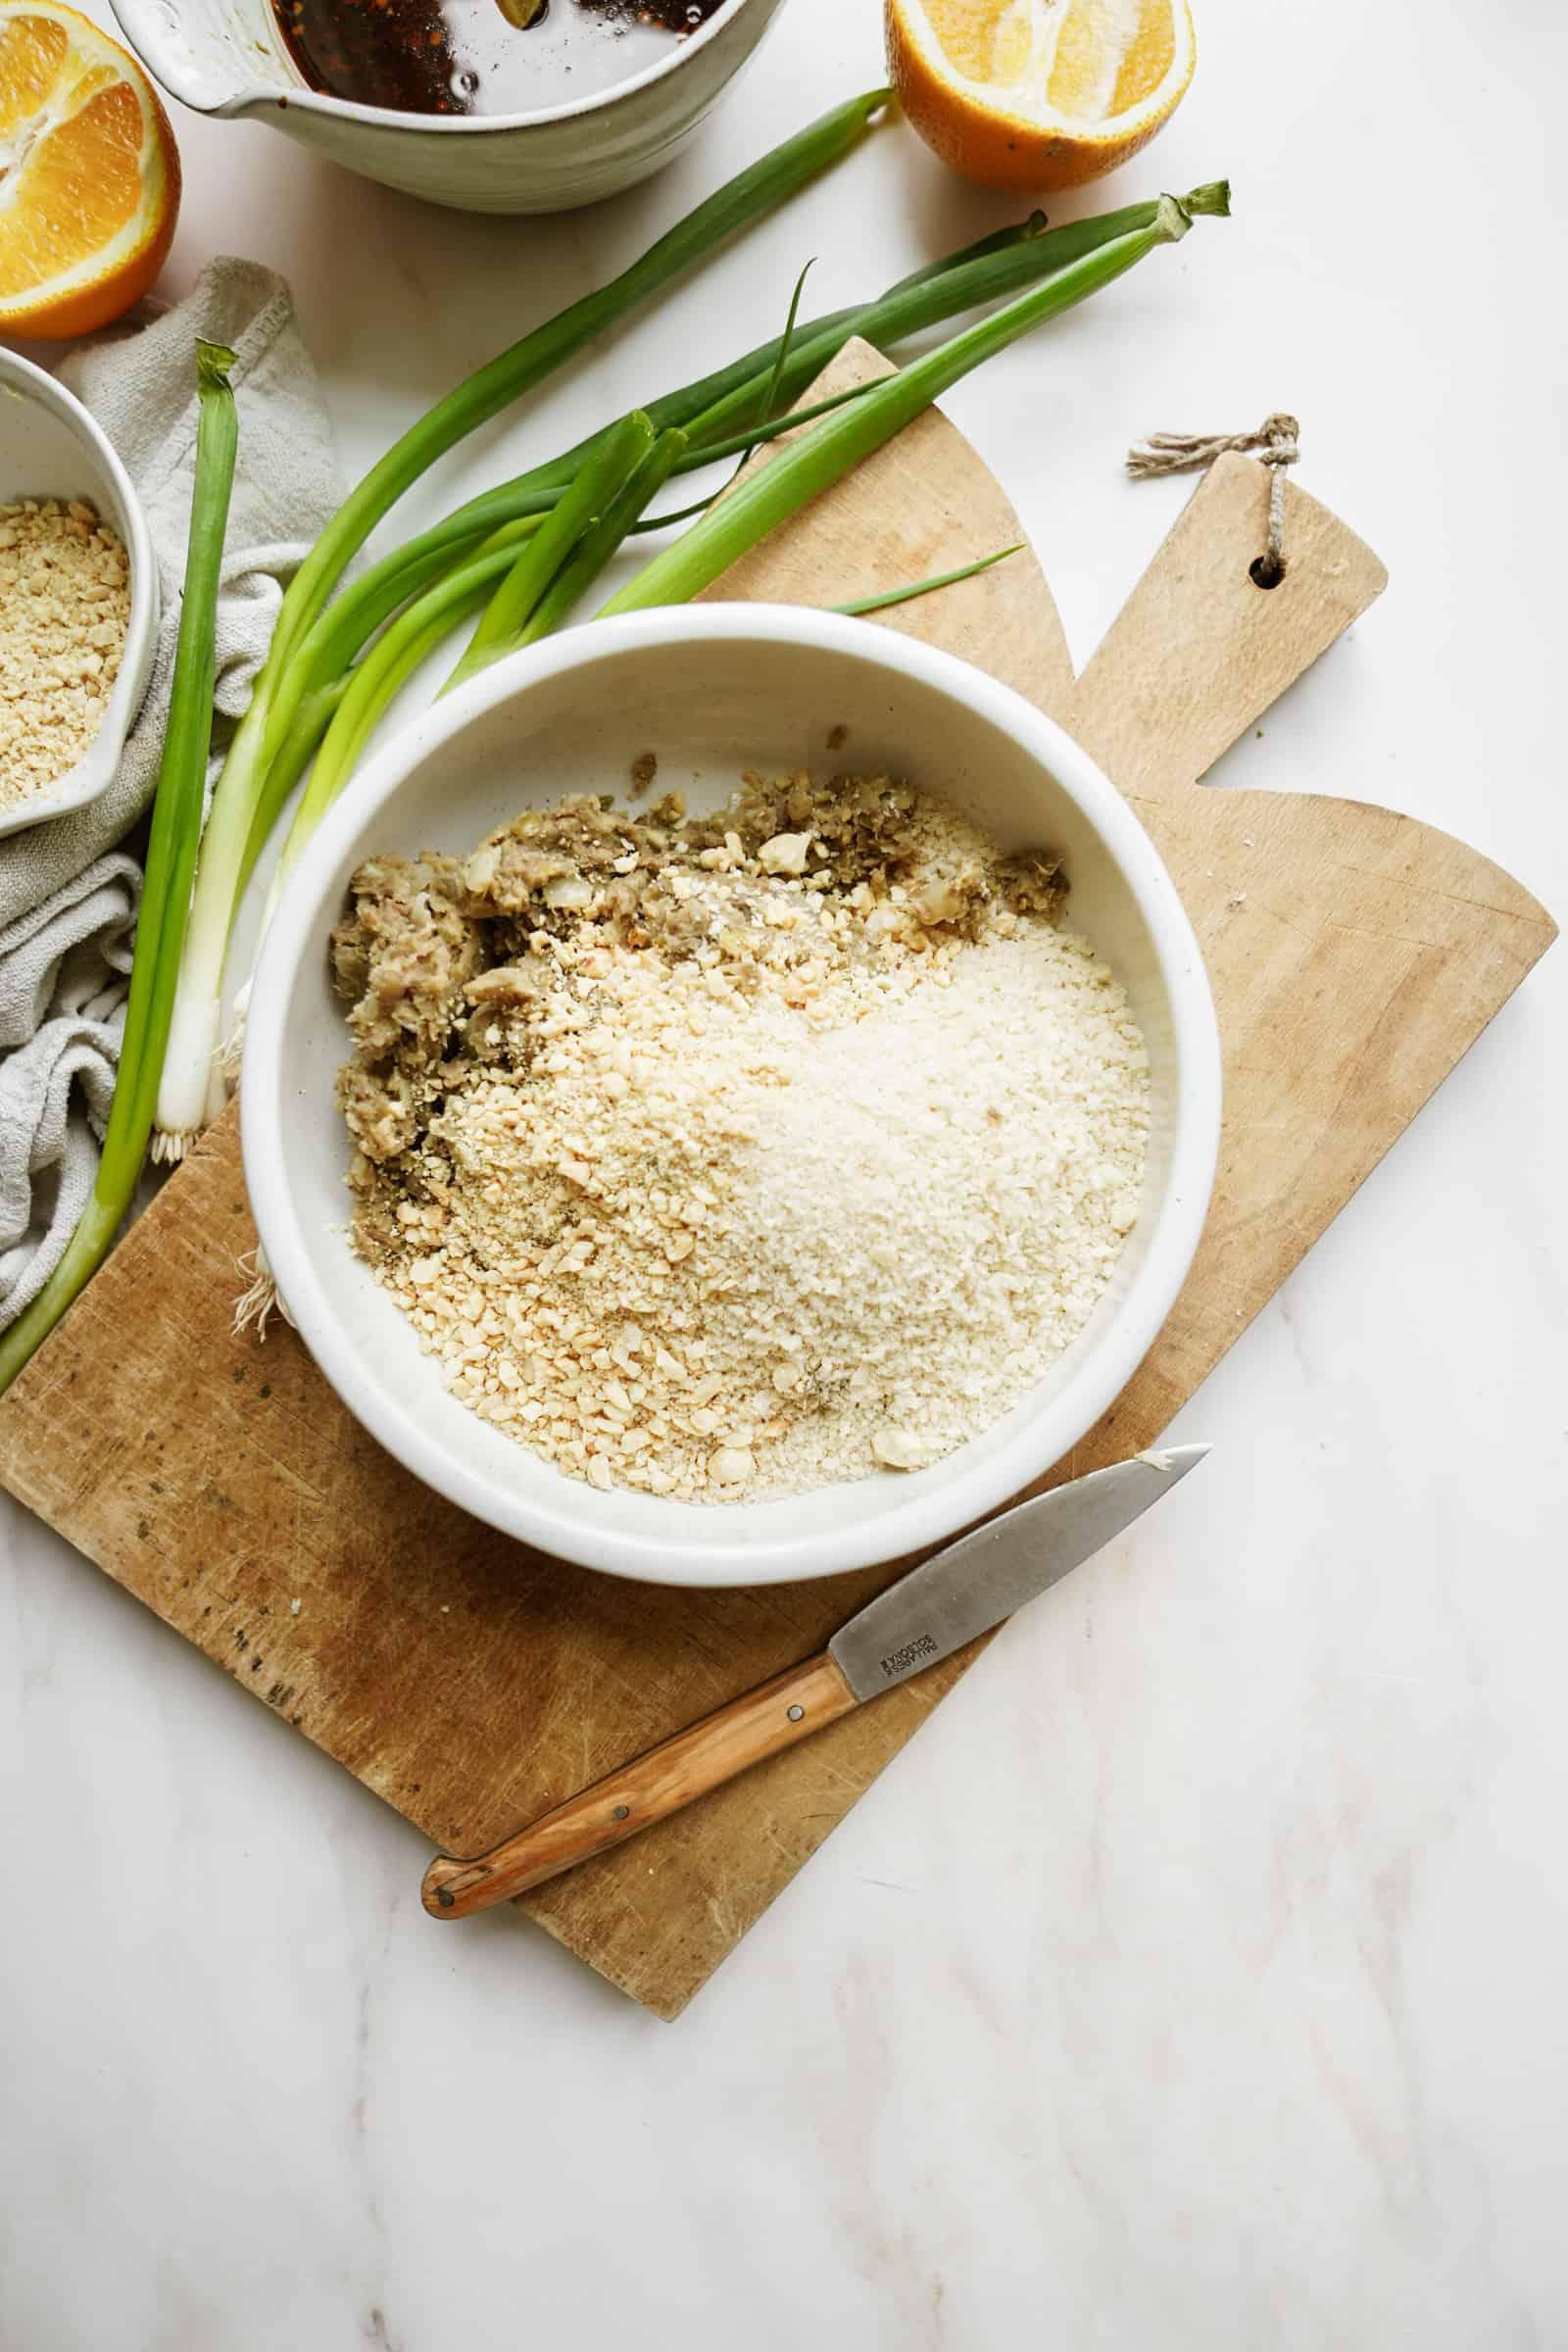 Dry ingredients for lentil meatballs in a bowl